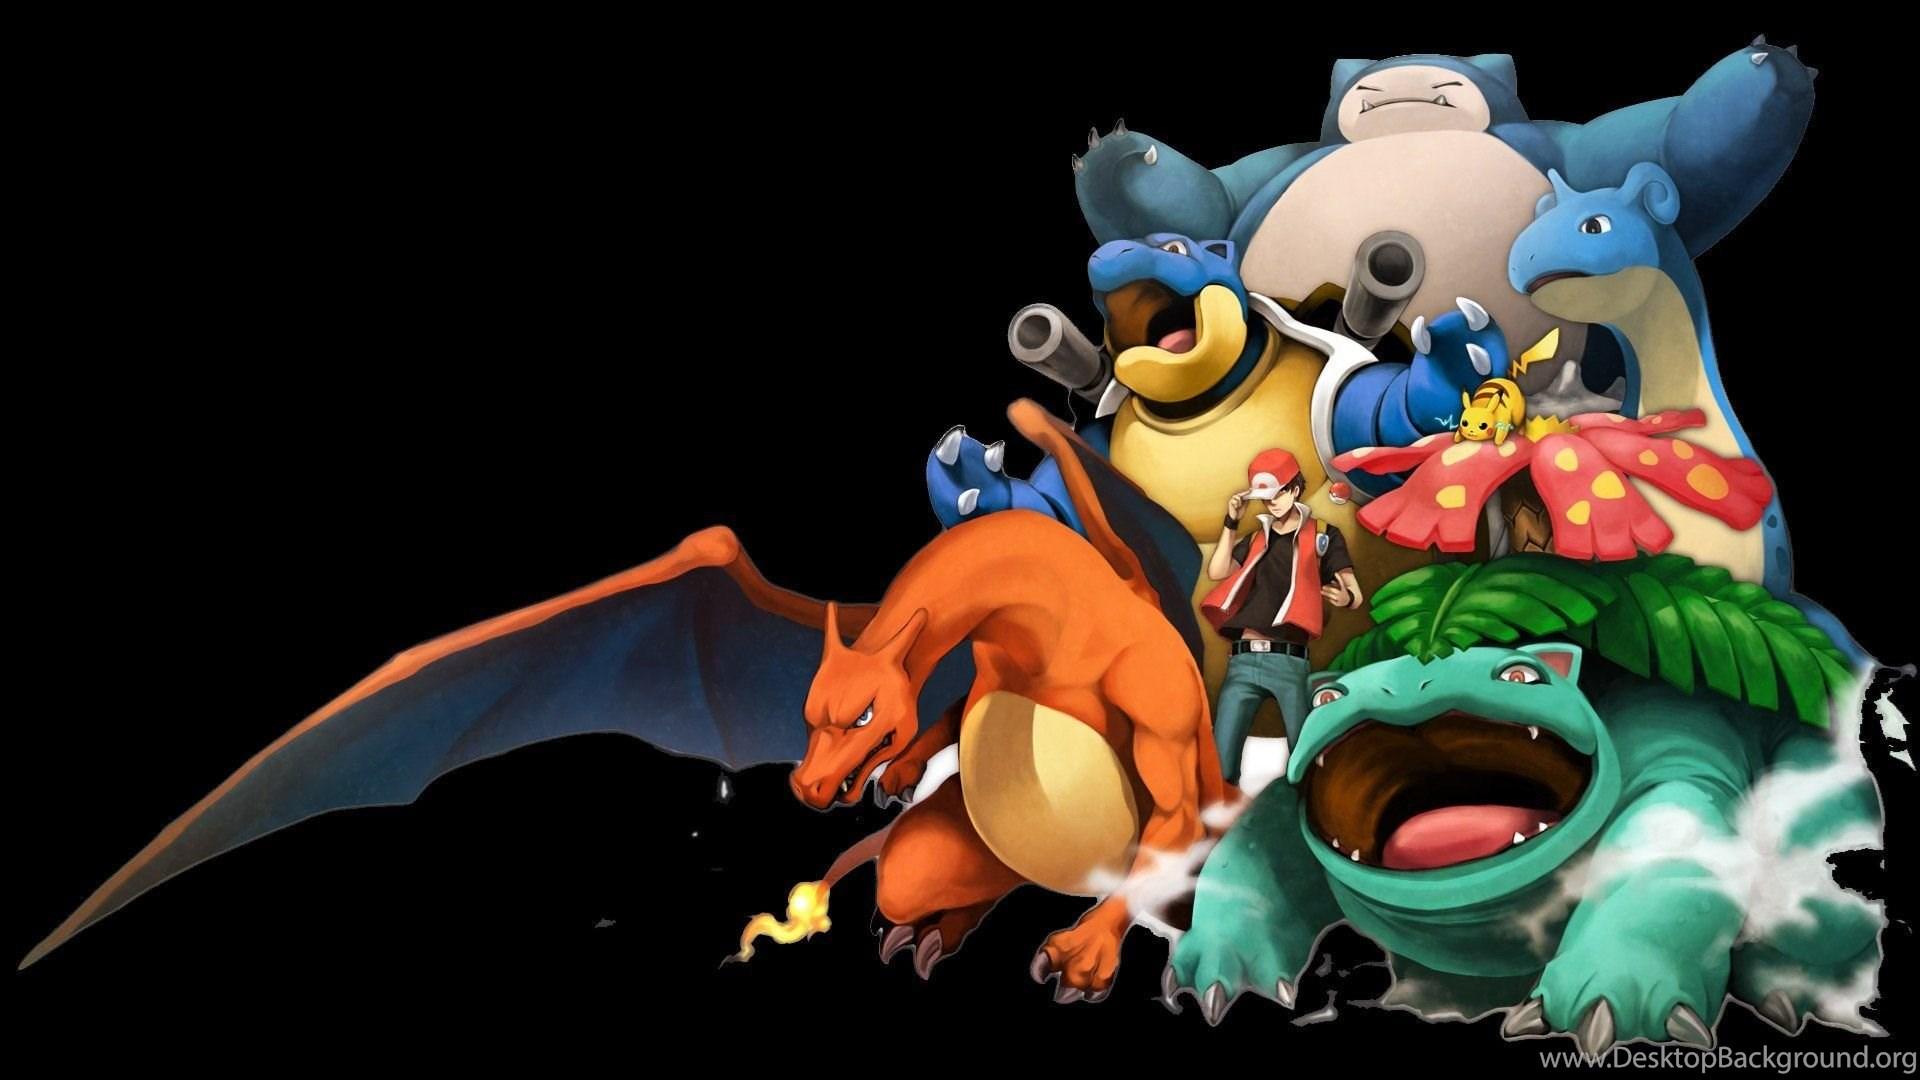 Fonds D Ecran Pokemon Tous Les Wallpapers Pokemon Desktop Background